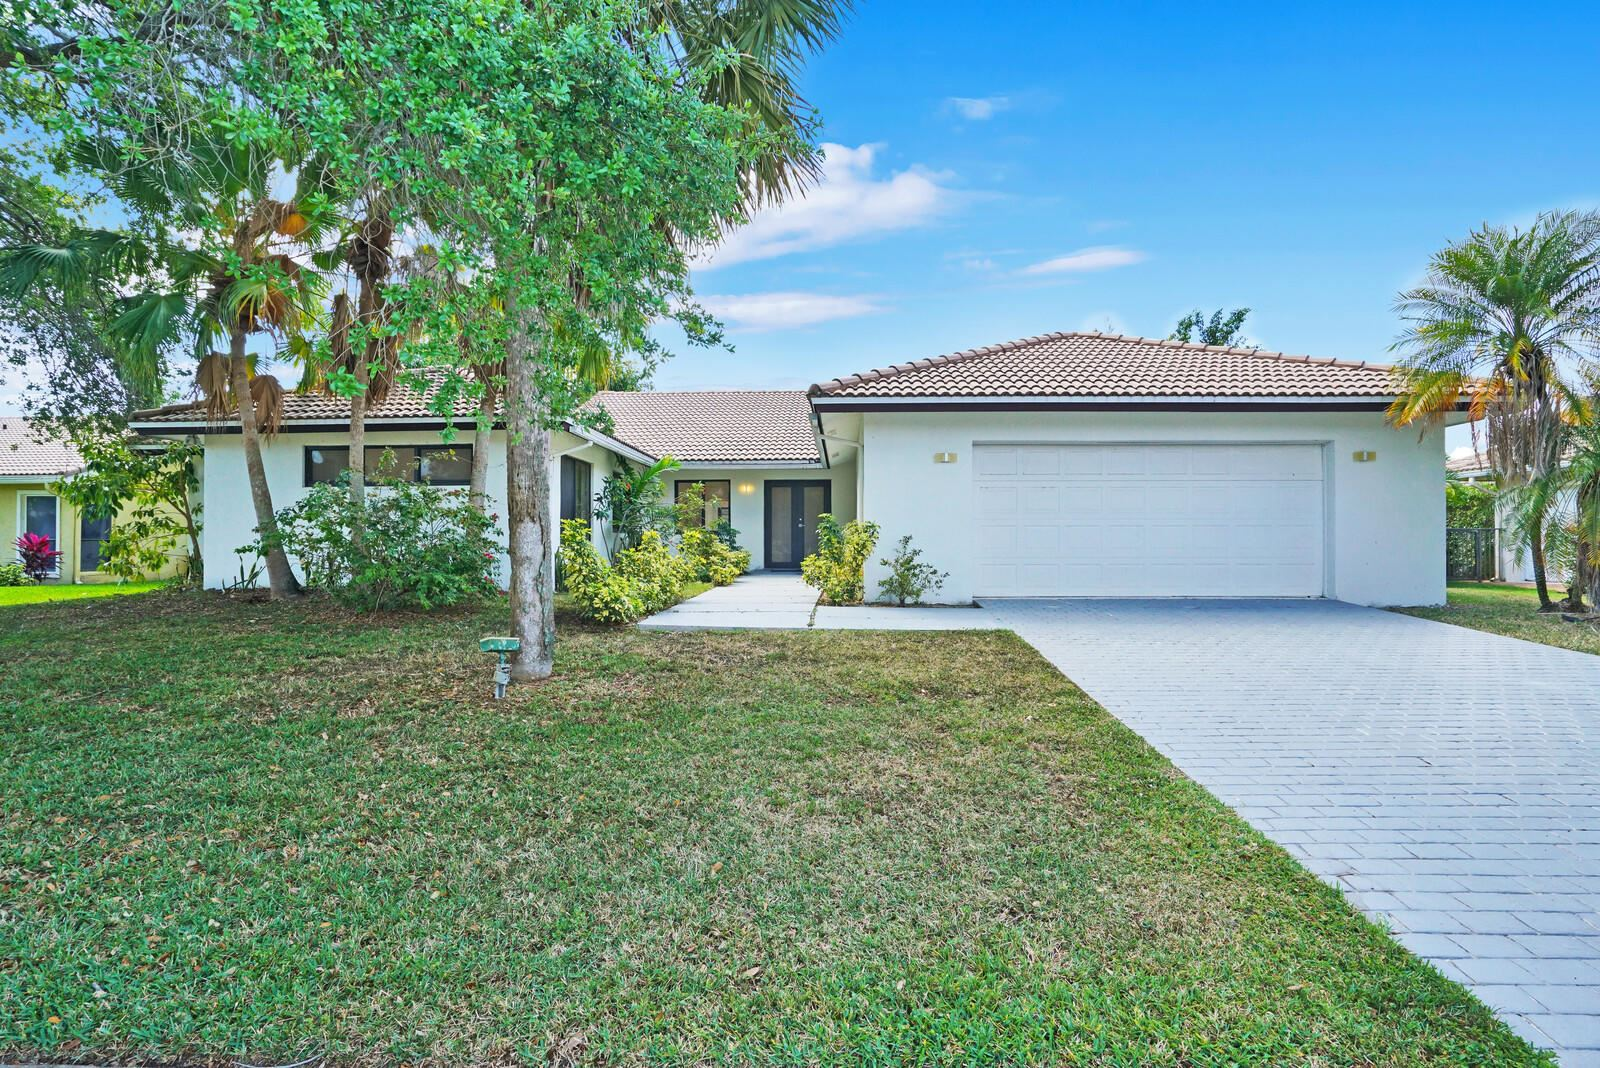 4512 White Cedar Lane, Delray Beach, FL 33445 - #: RX-10703235